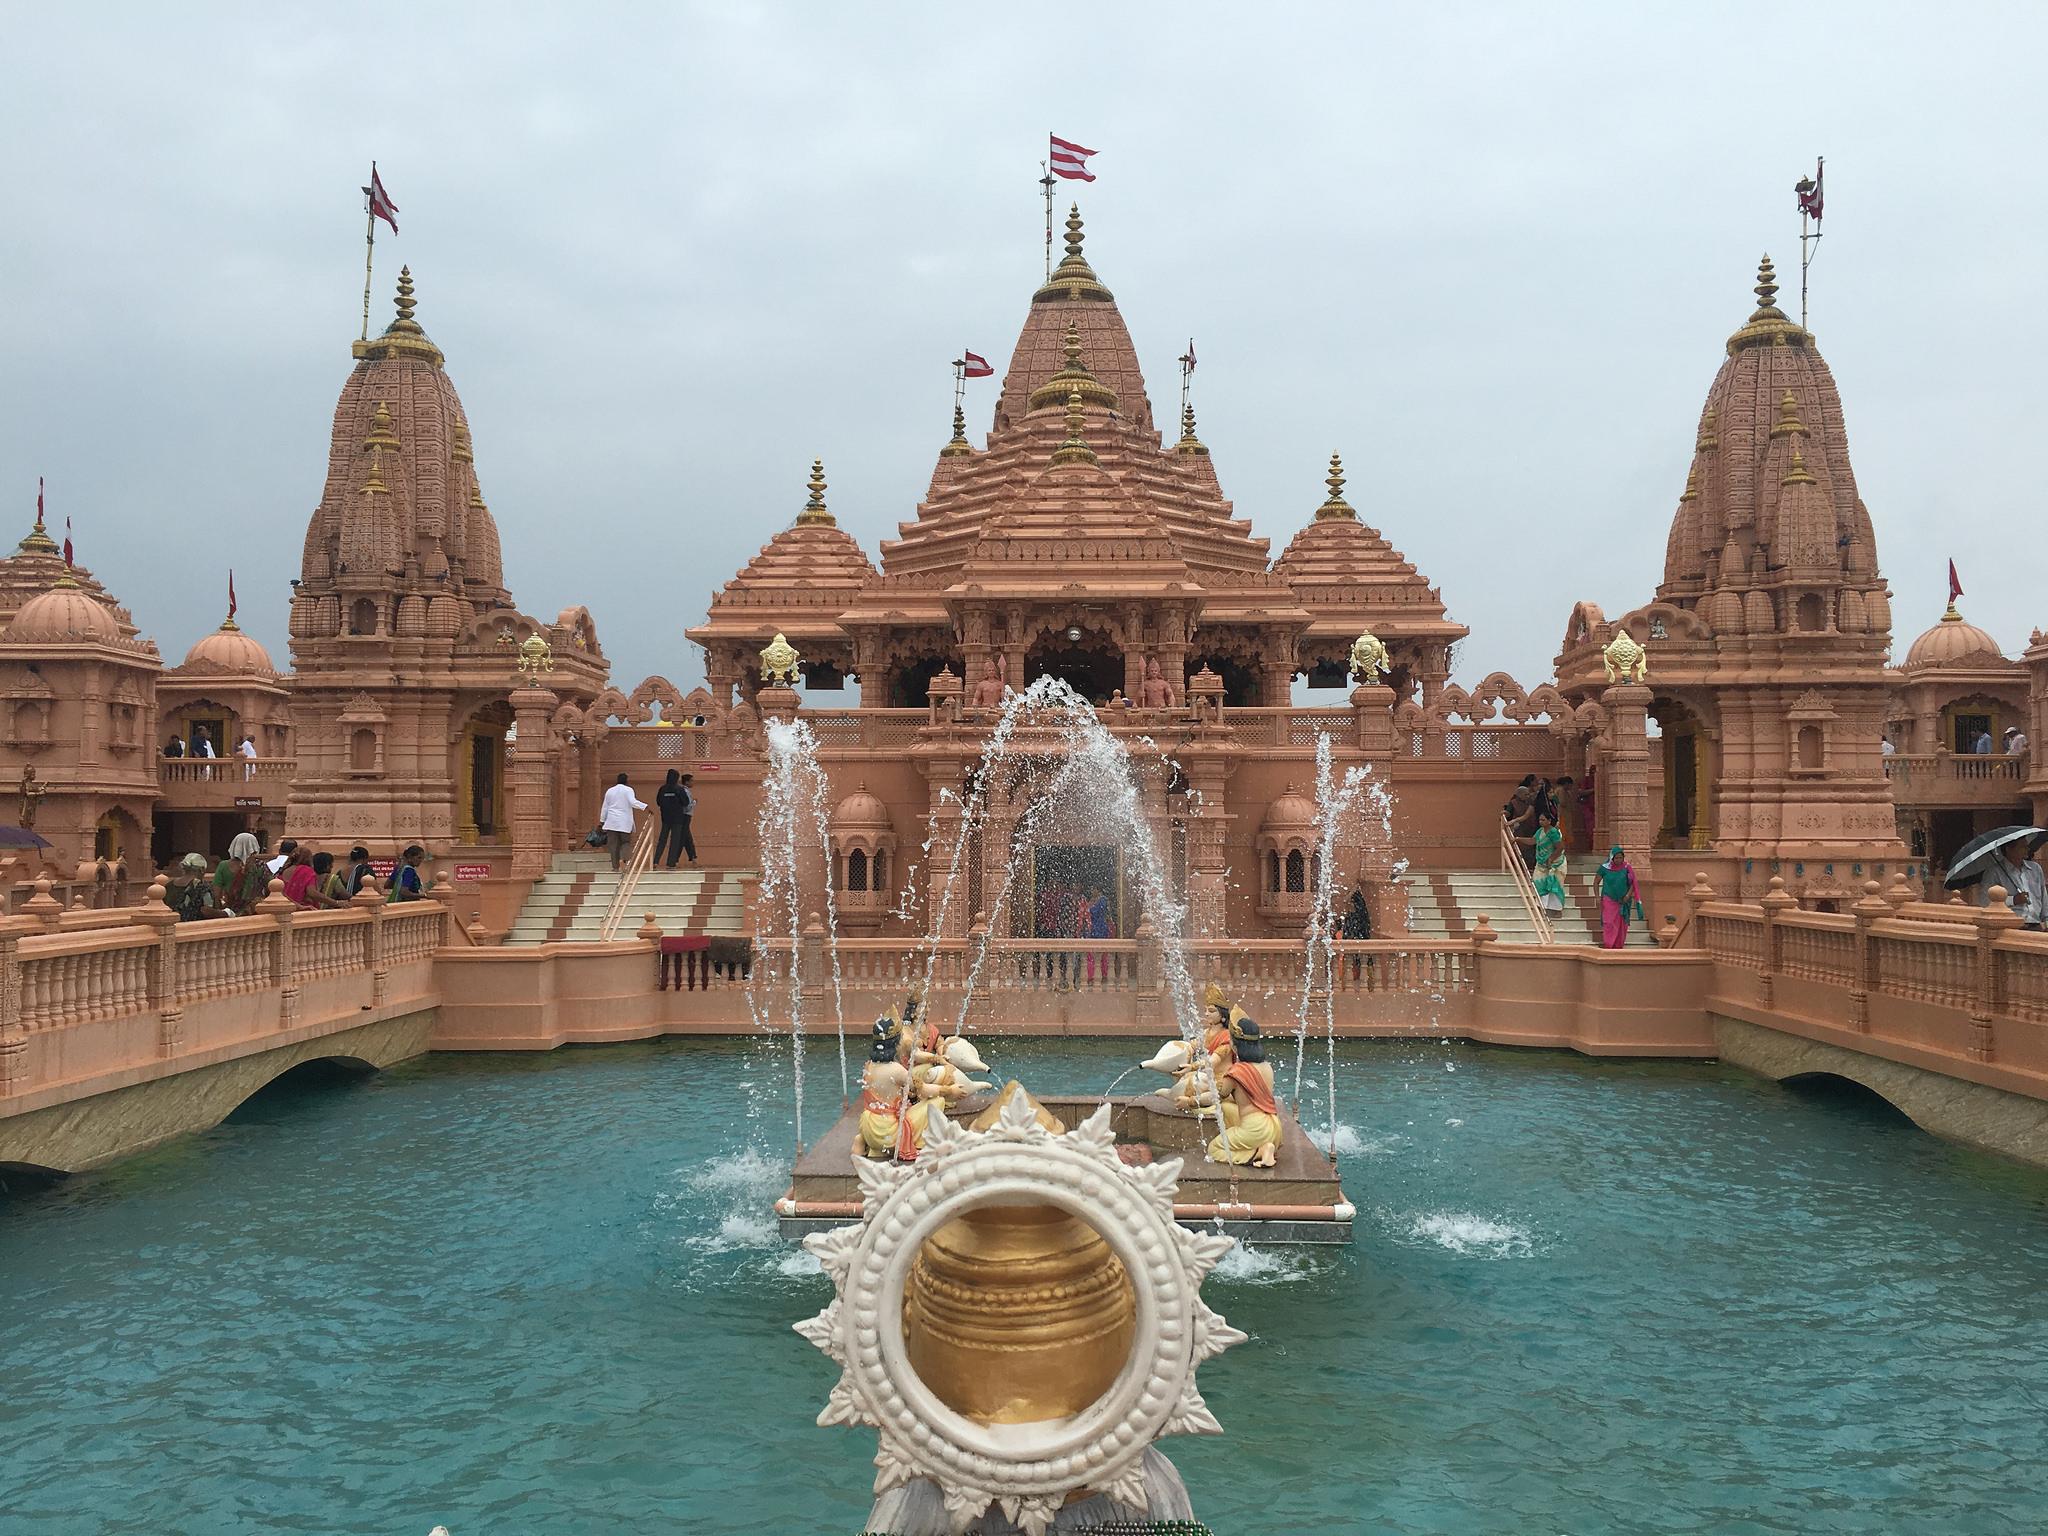 Poicha Swaminarayan Temple Gujarat on the way of statue of unity